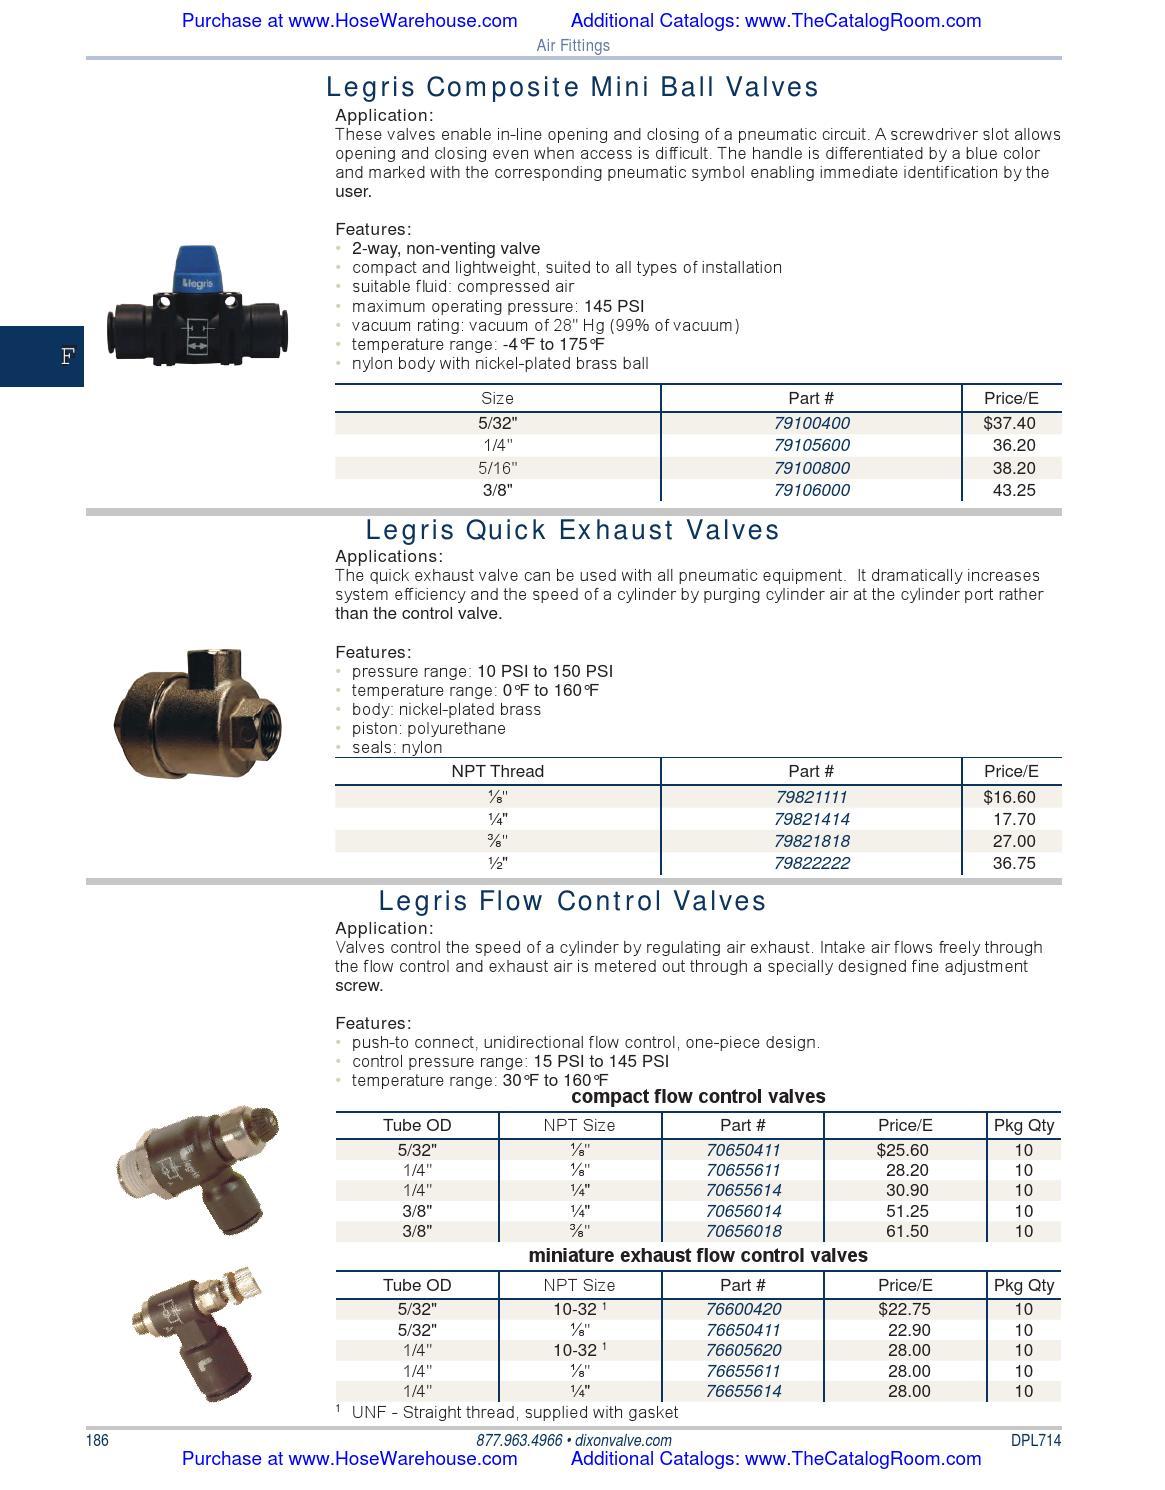 1//2 Nylon Seal Dixon 79822222 NPT Quick Exhaust Valve Nickel Plated Brass Body